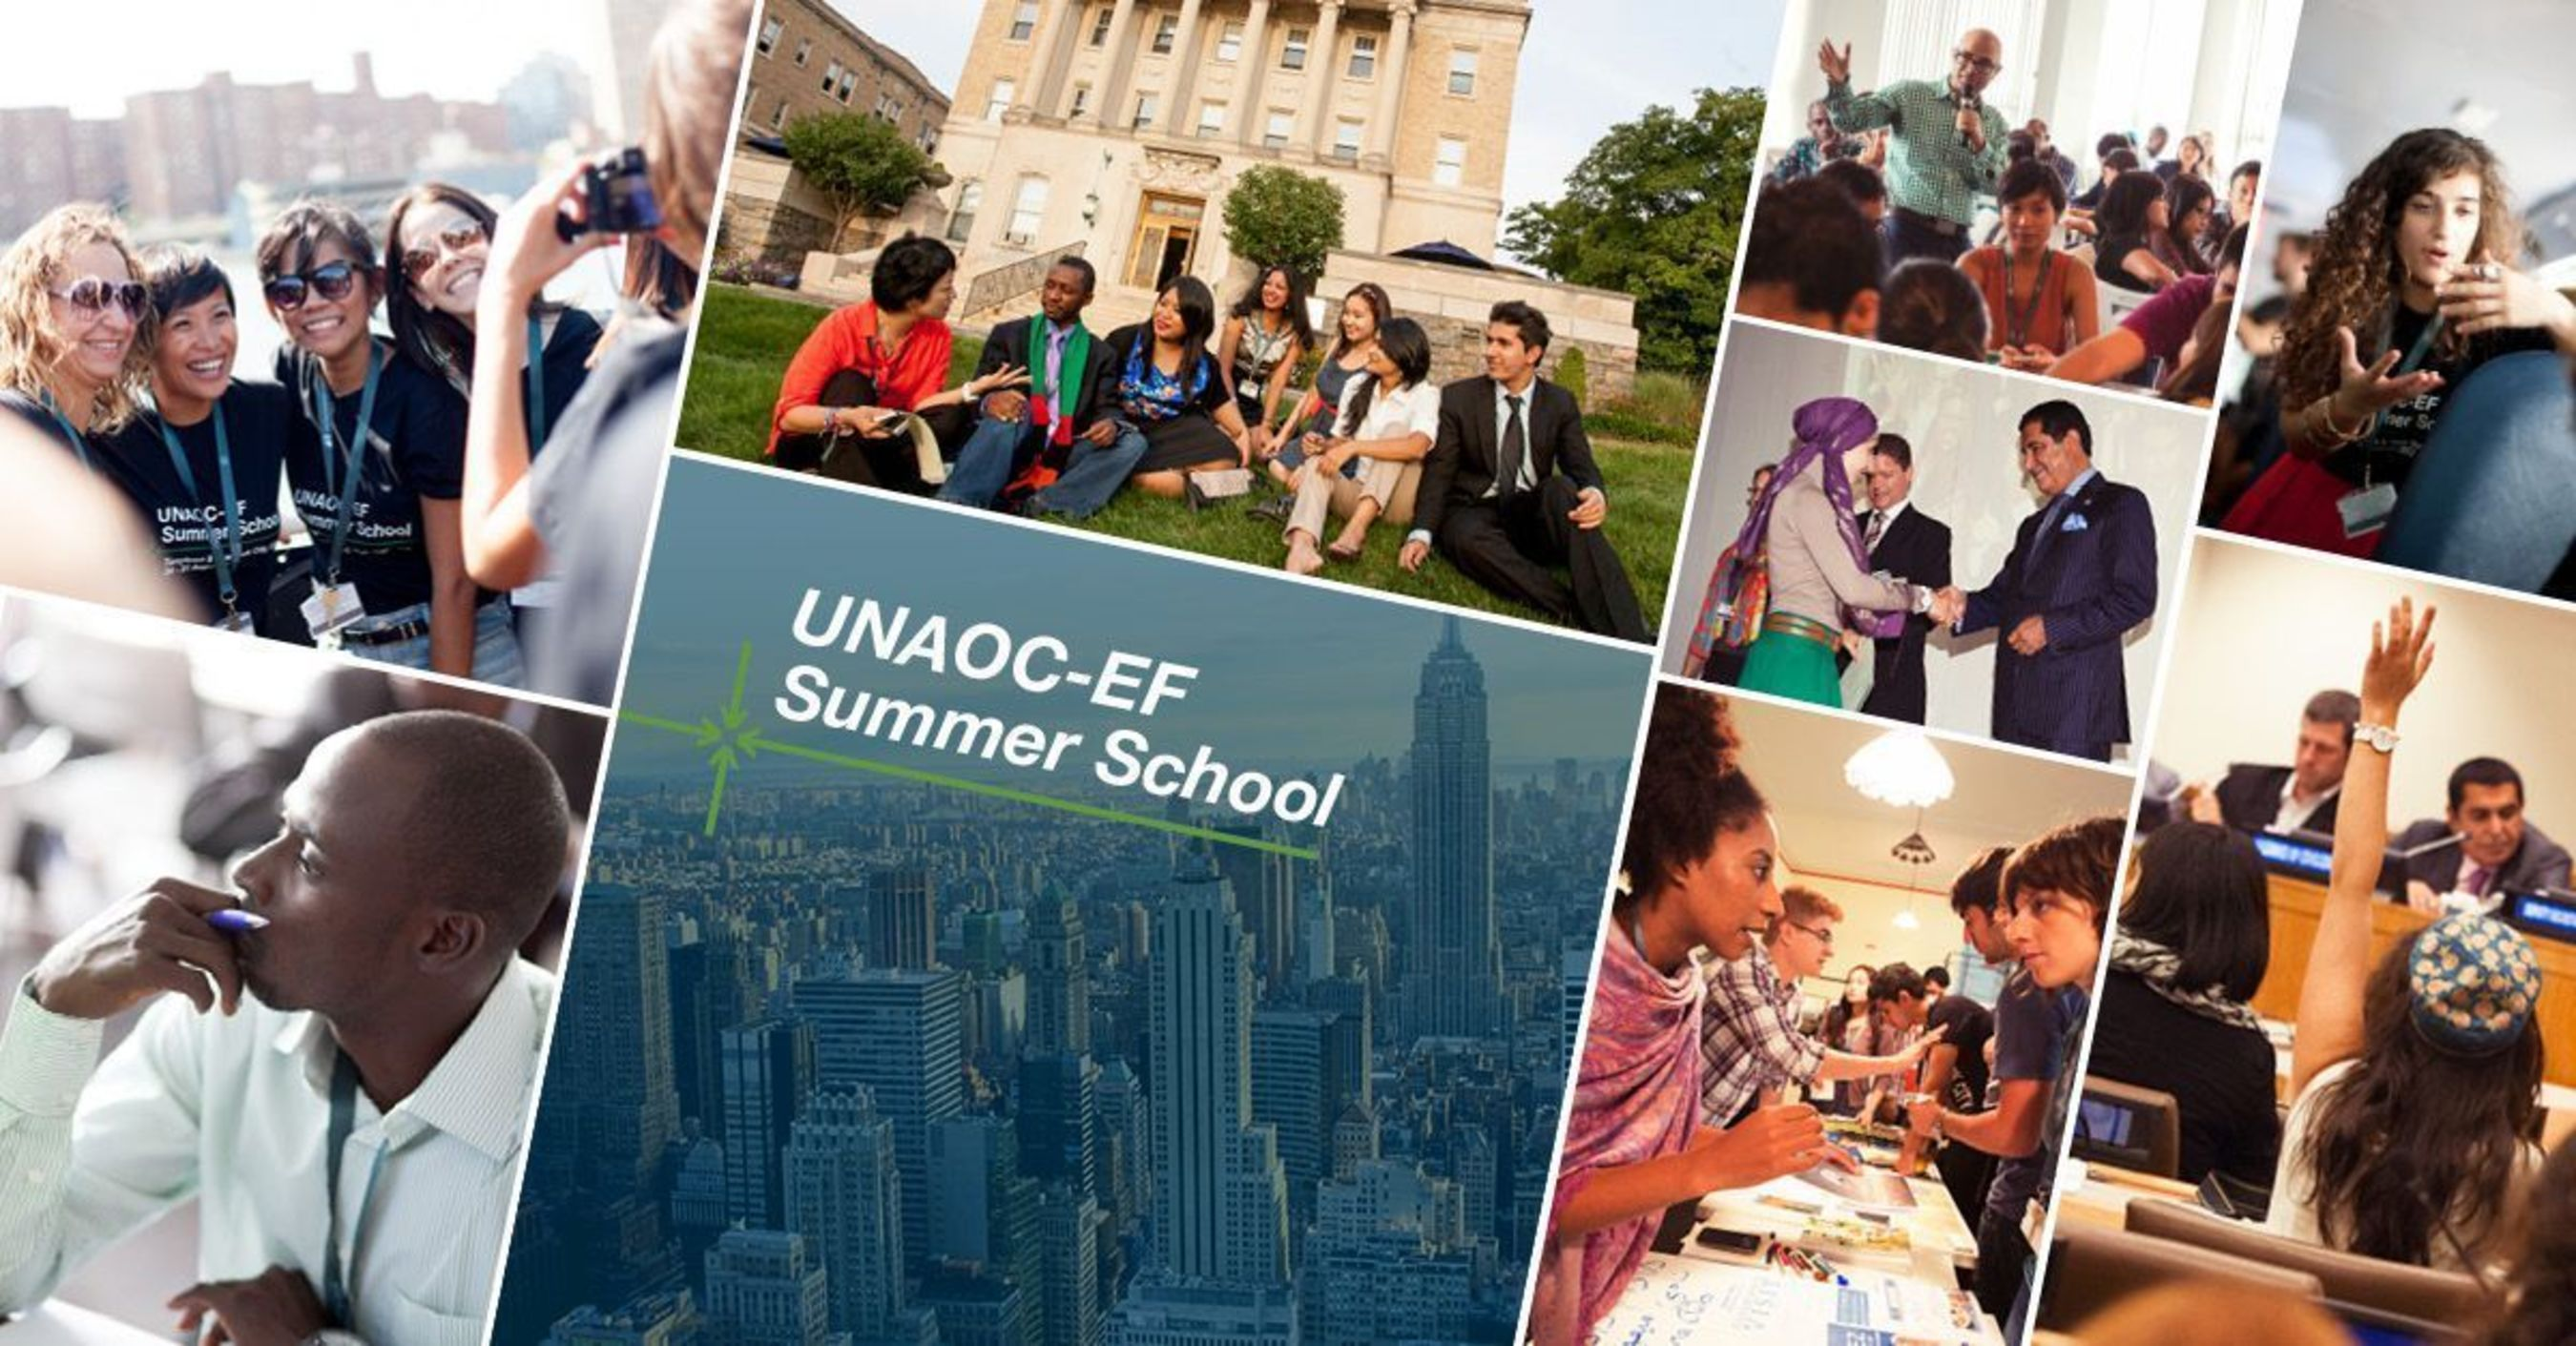 Apply now for the UNAOC-EF Summer School in Tarrytown, New York. (PRNewsFoto/EF Education First _EF_)